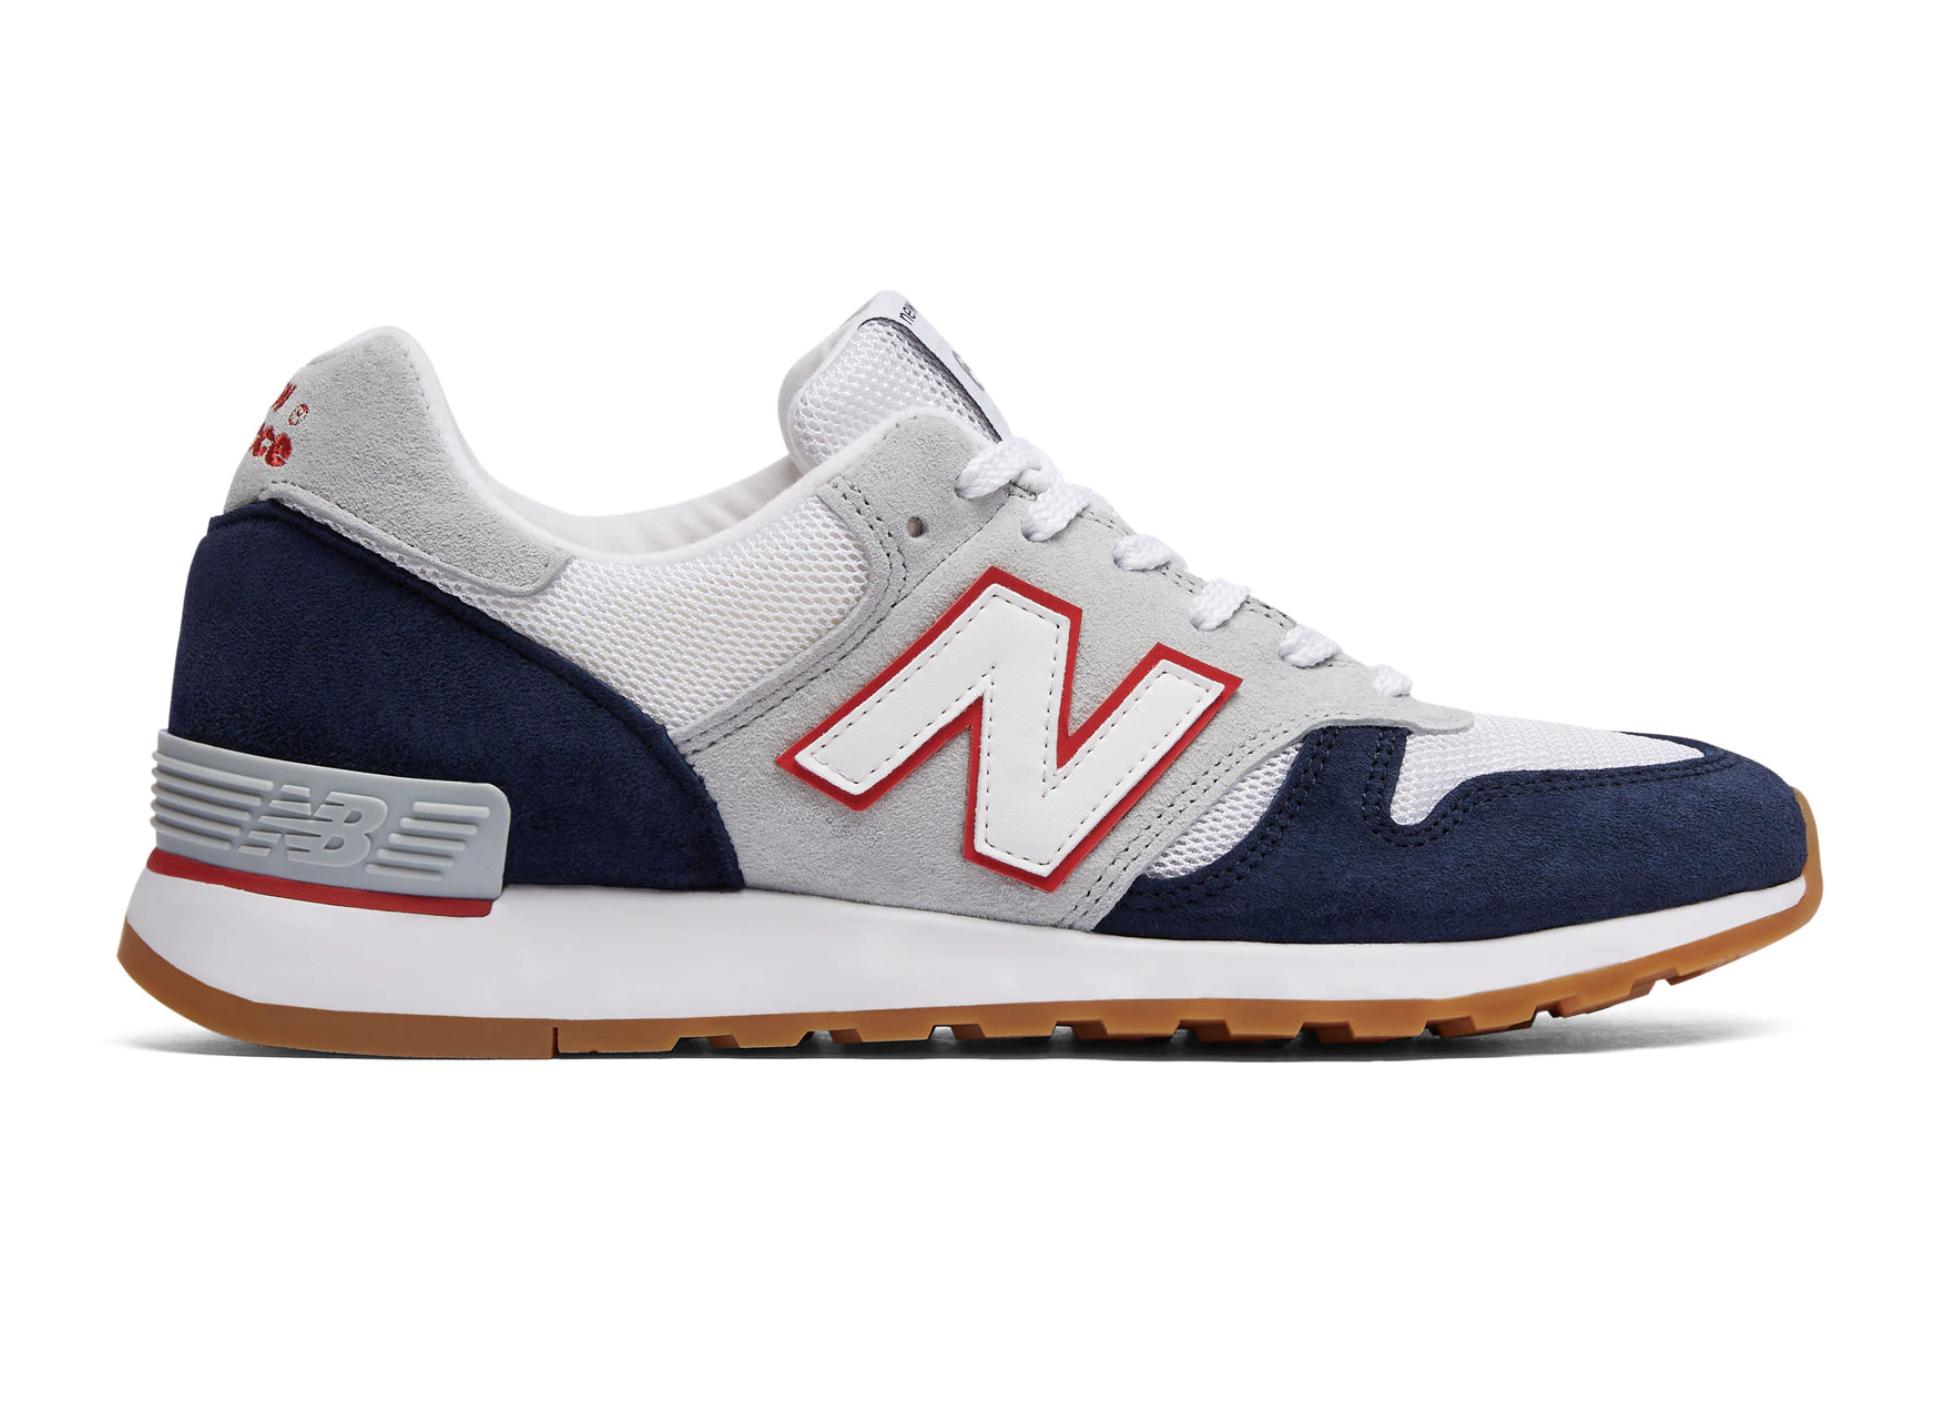 New Balance 670 Grey/Navy